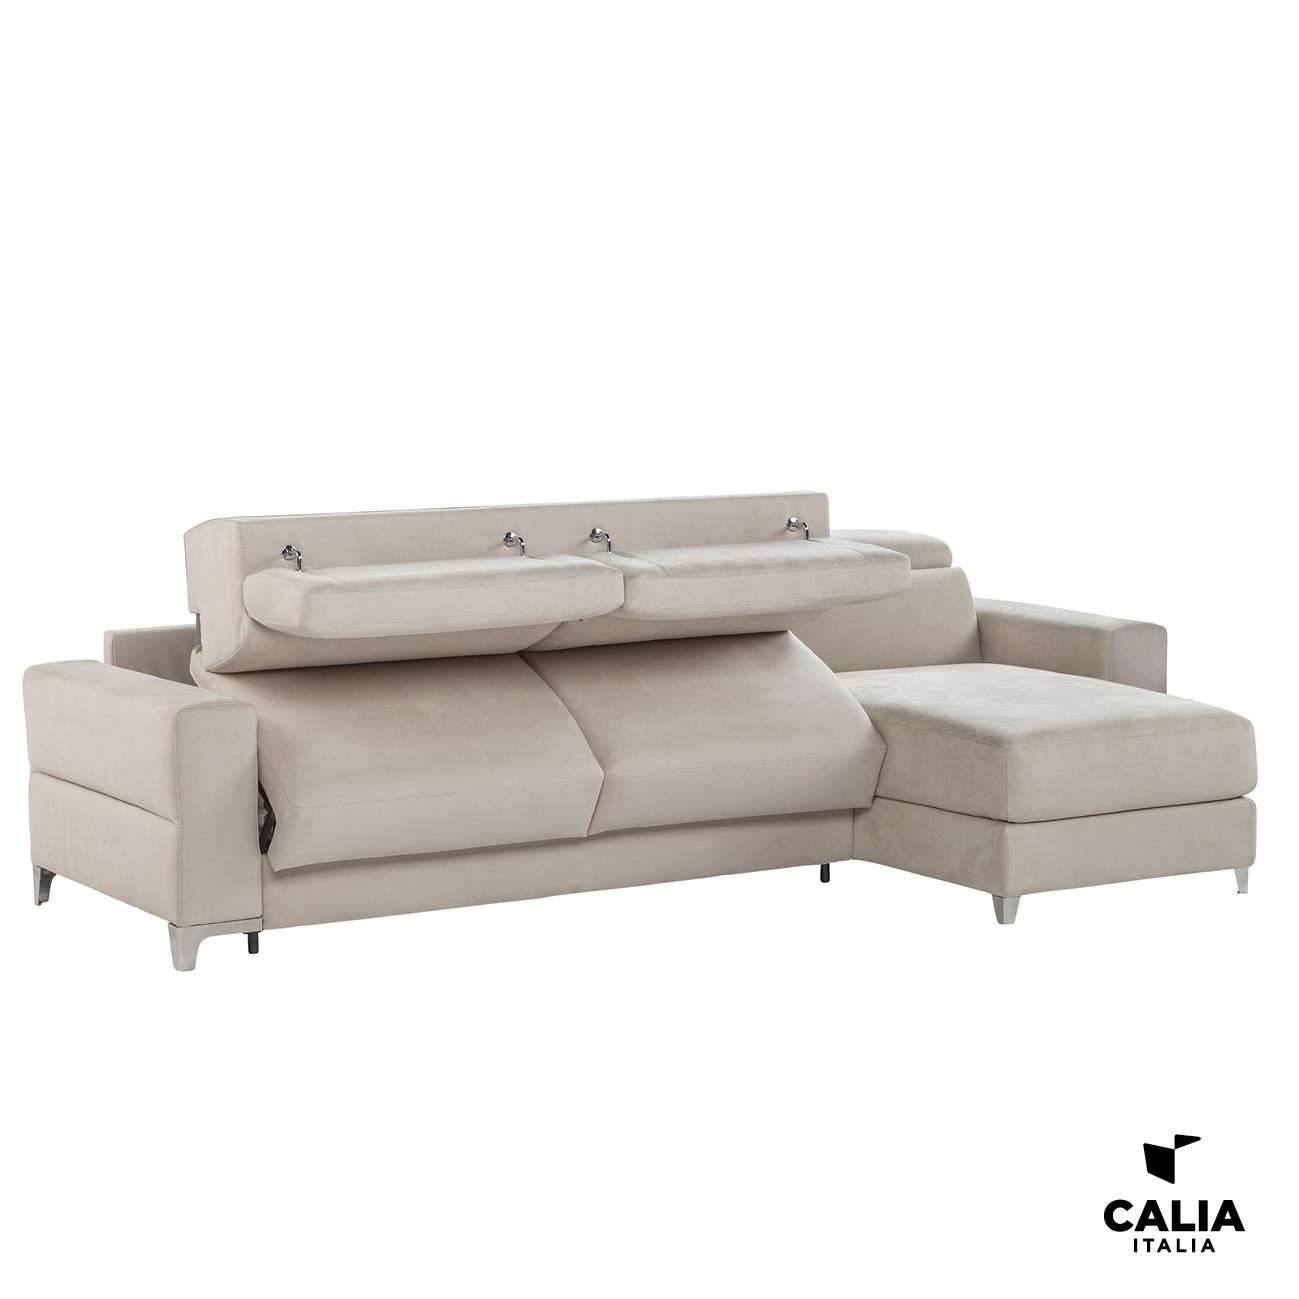 Caliaitalia - Eclettico